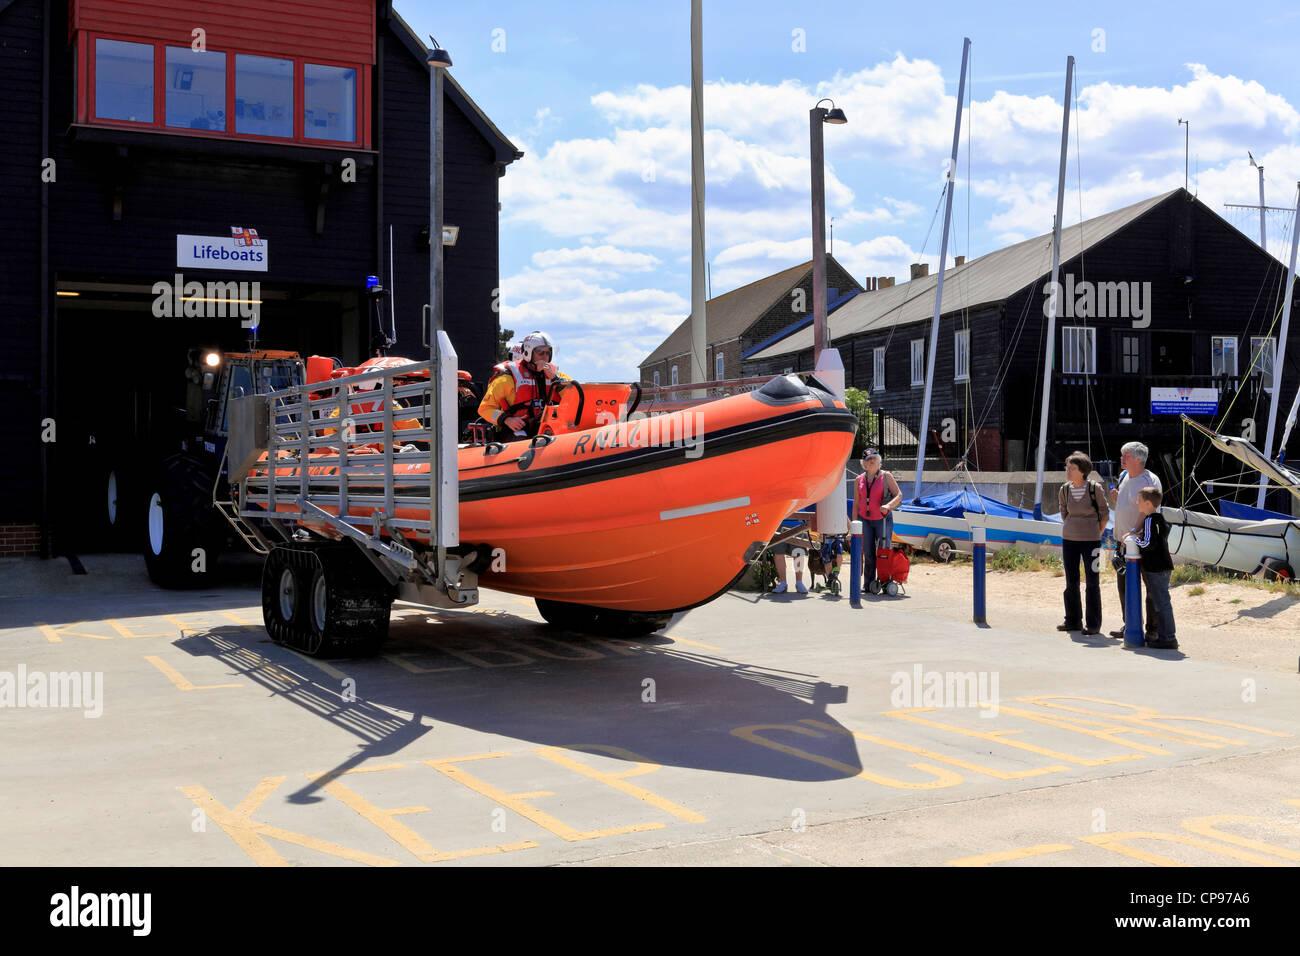 3911. RNLI Lifeboat launching, Whitstable, Kent, UK Stock Photo